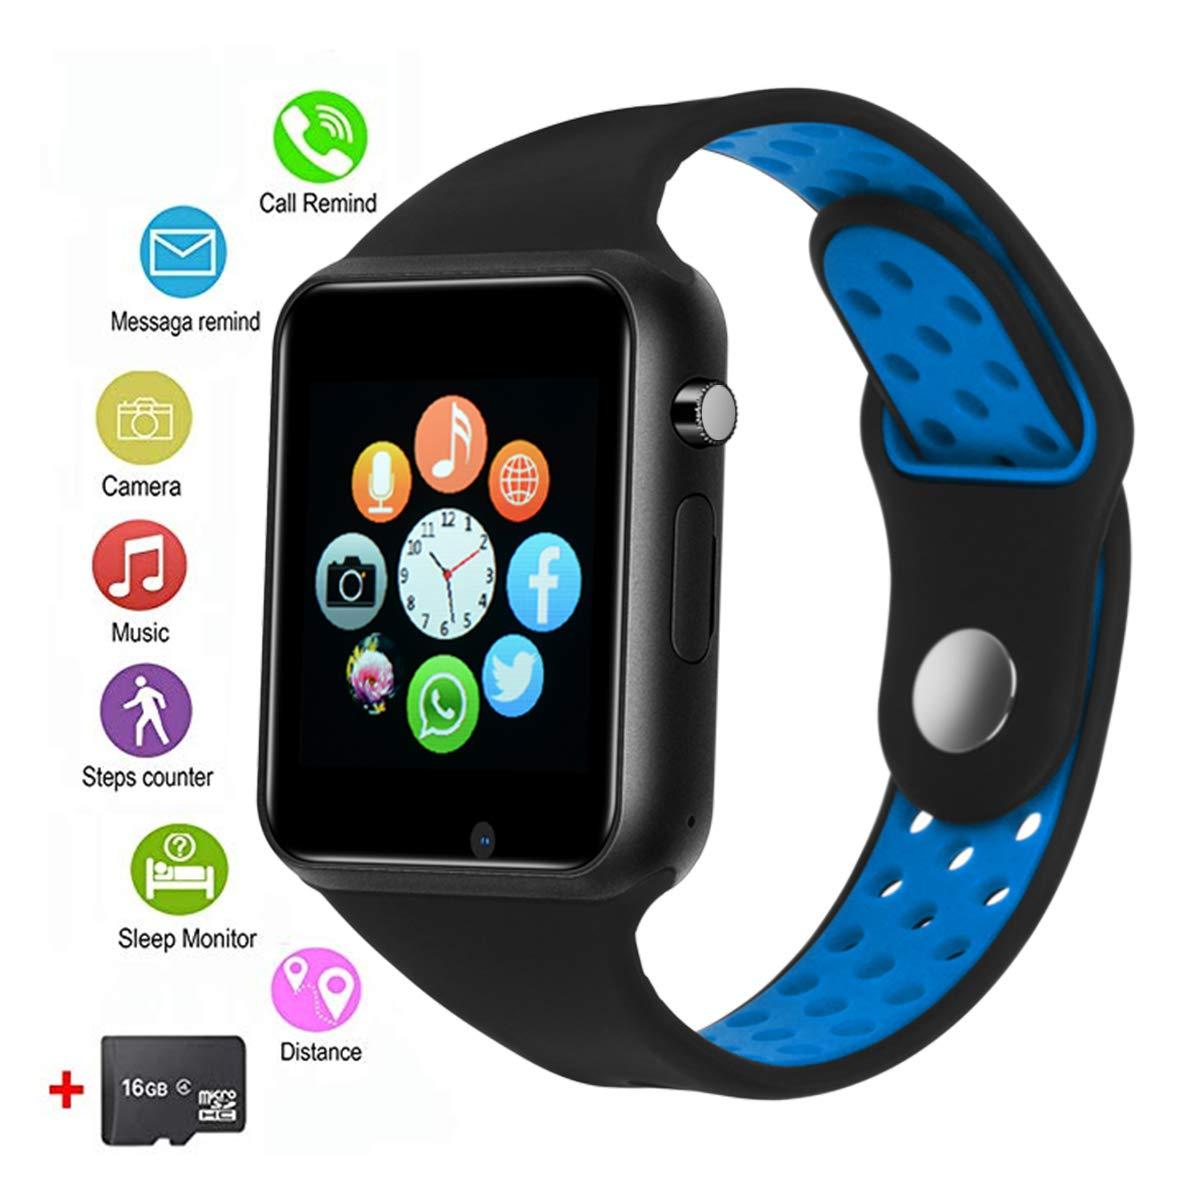 Smartwach, JACSSO Smart Watch Men Women, Bluetooth Smart Watches Phone Compatible Android Phones